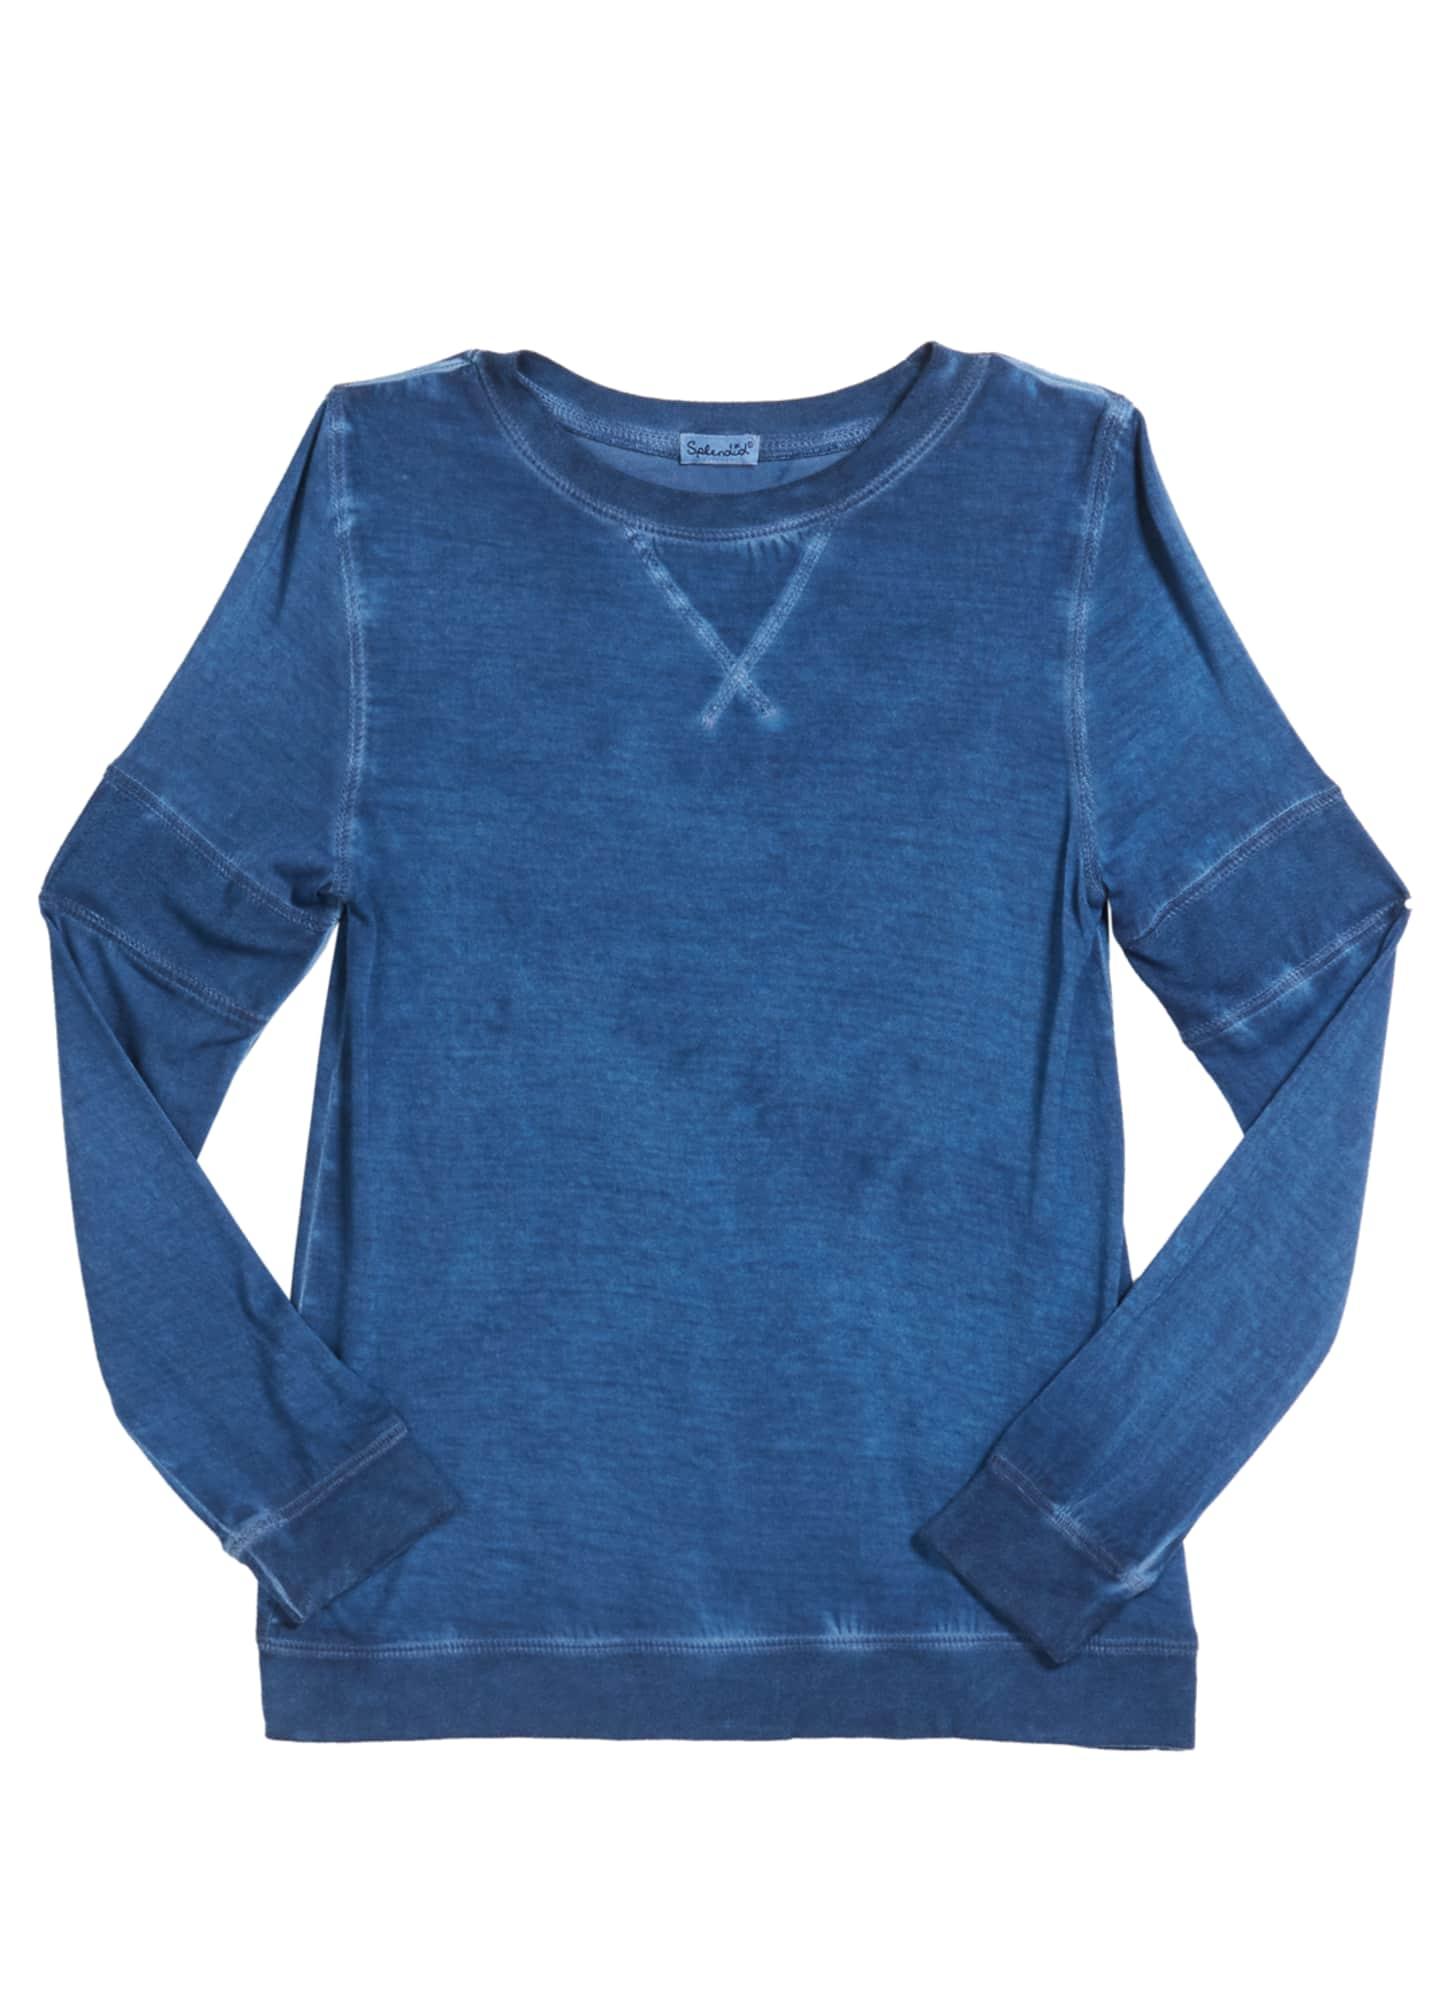 Splendid Girl's Oil Wash Jersey Top, Size 7-14